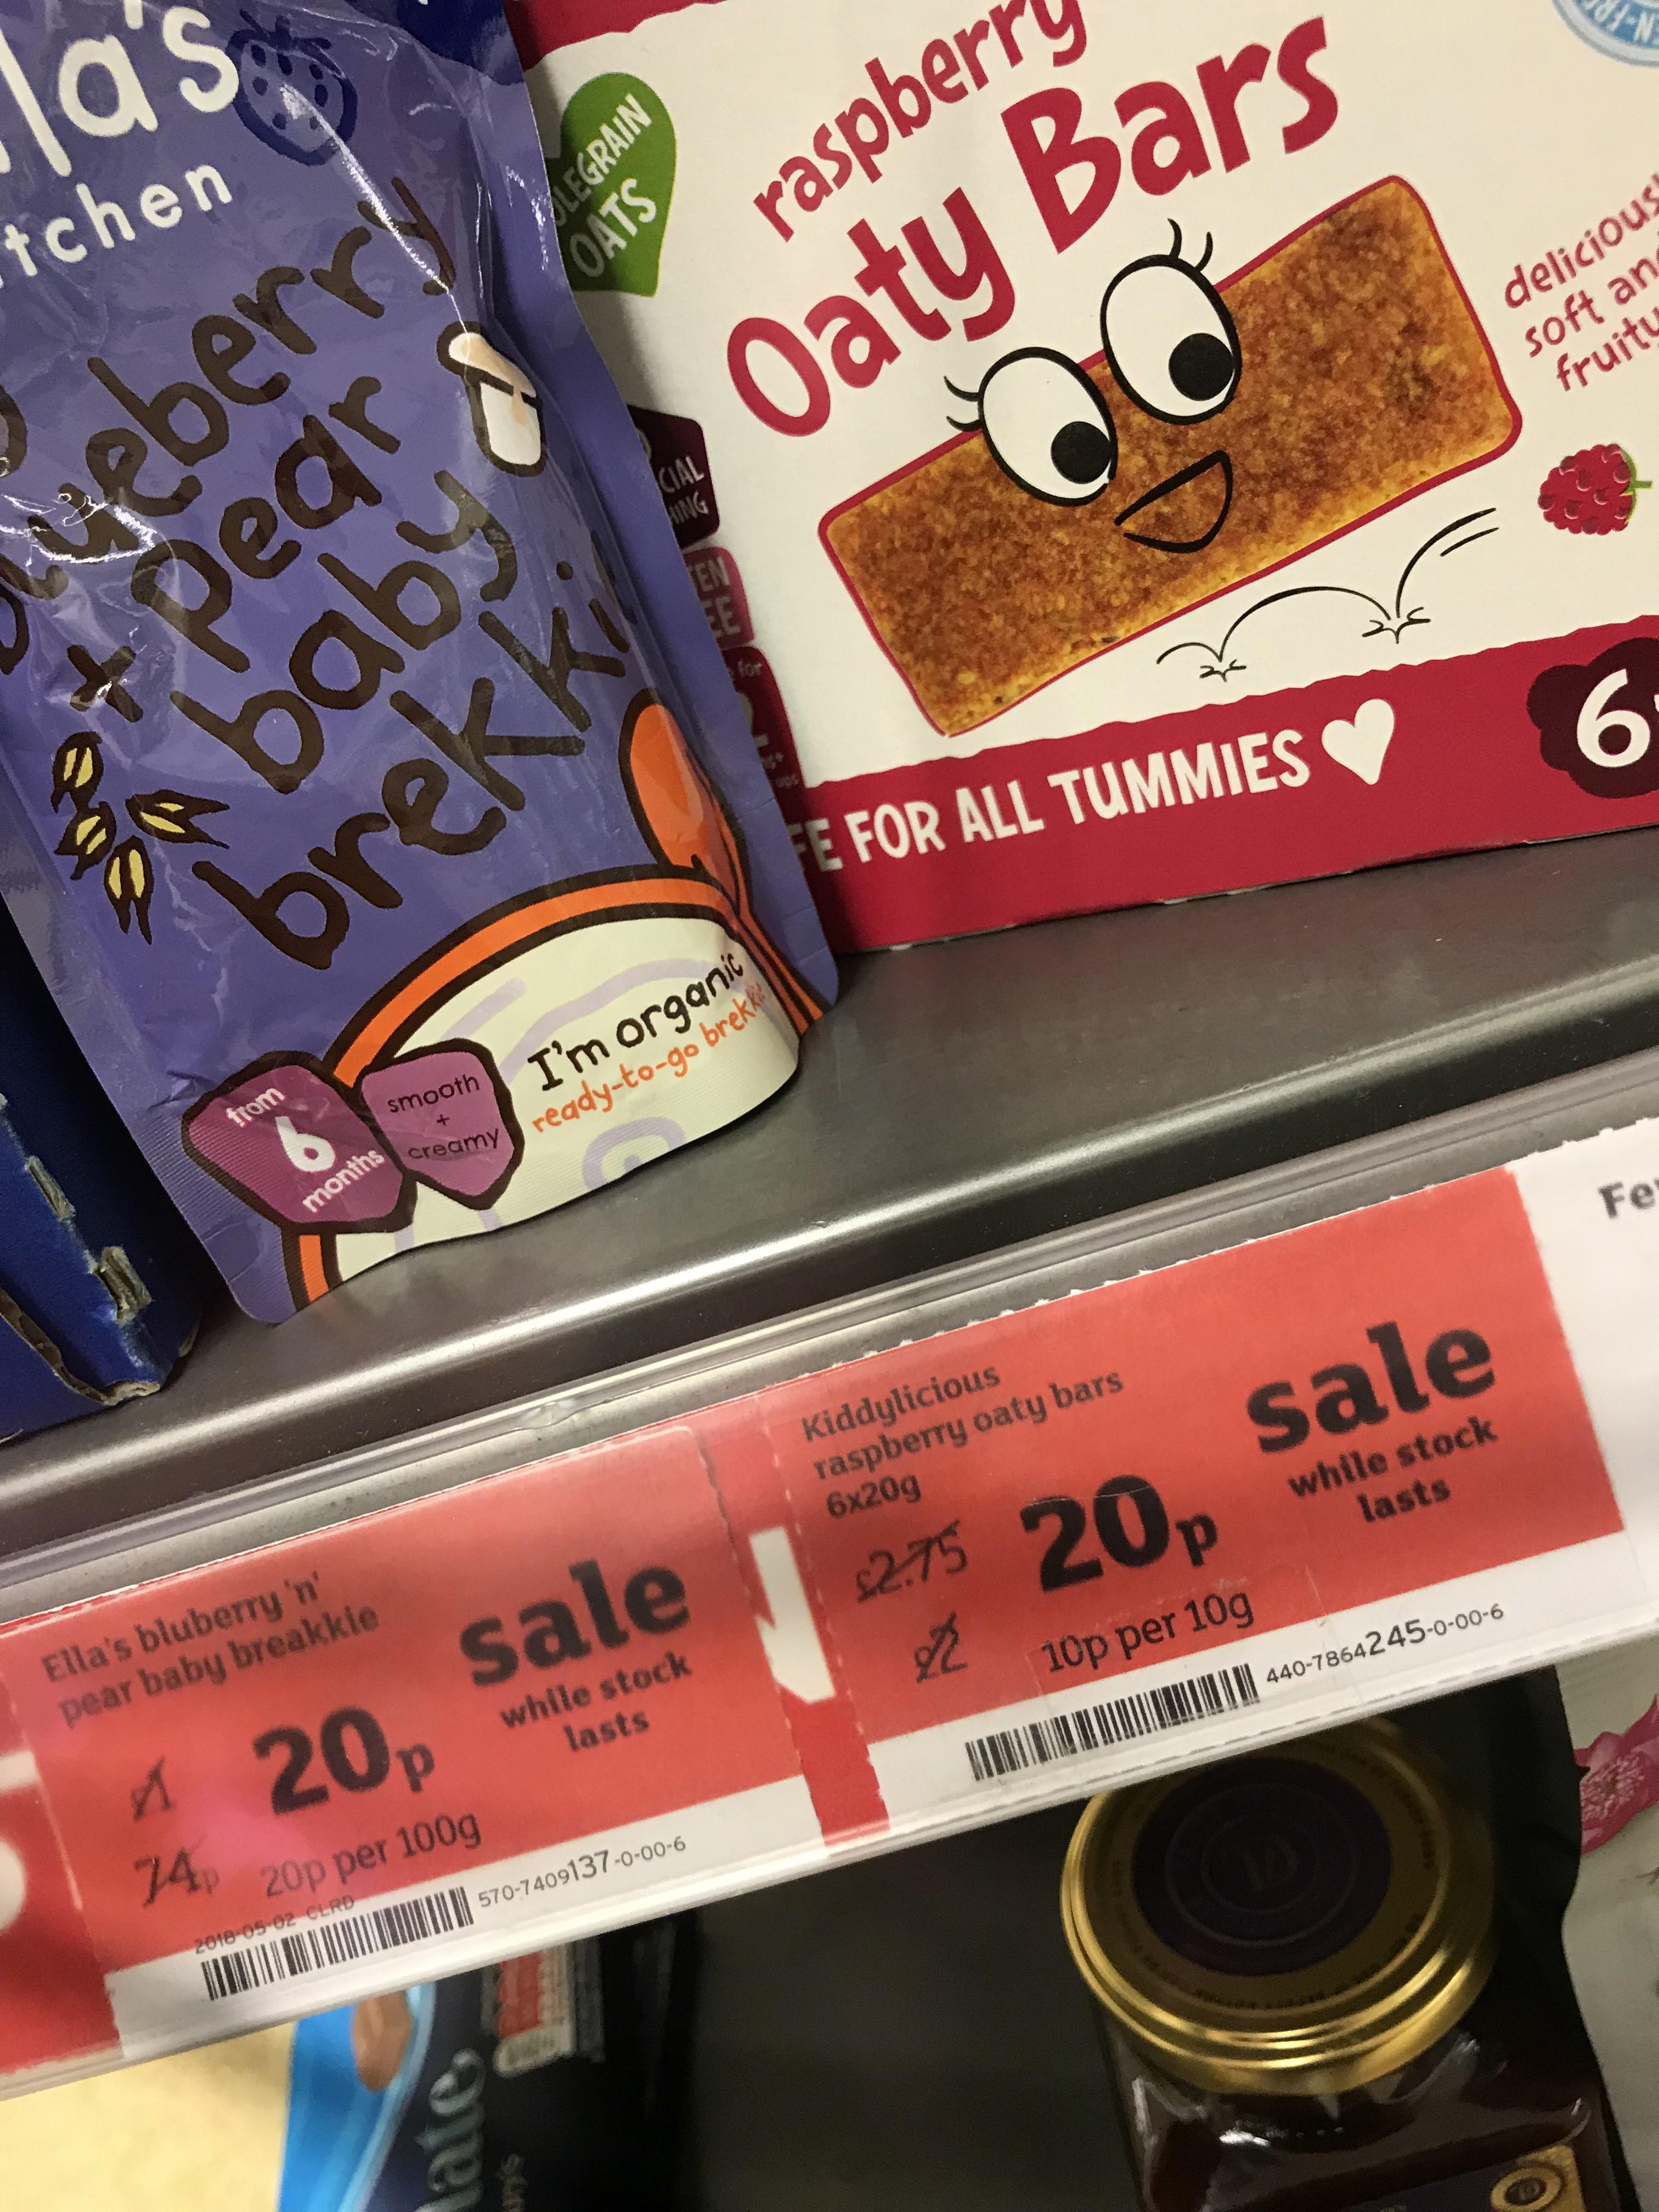 20p... Ella's kitchen brekki and kiddylicious bars at Sainsbury's instore